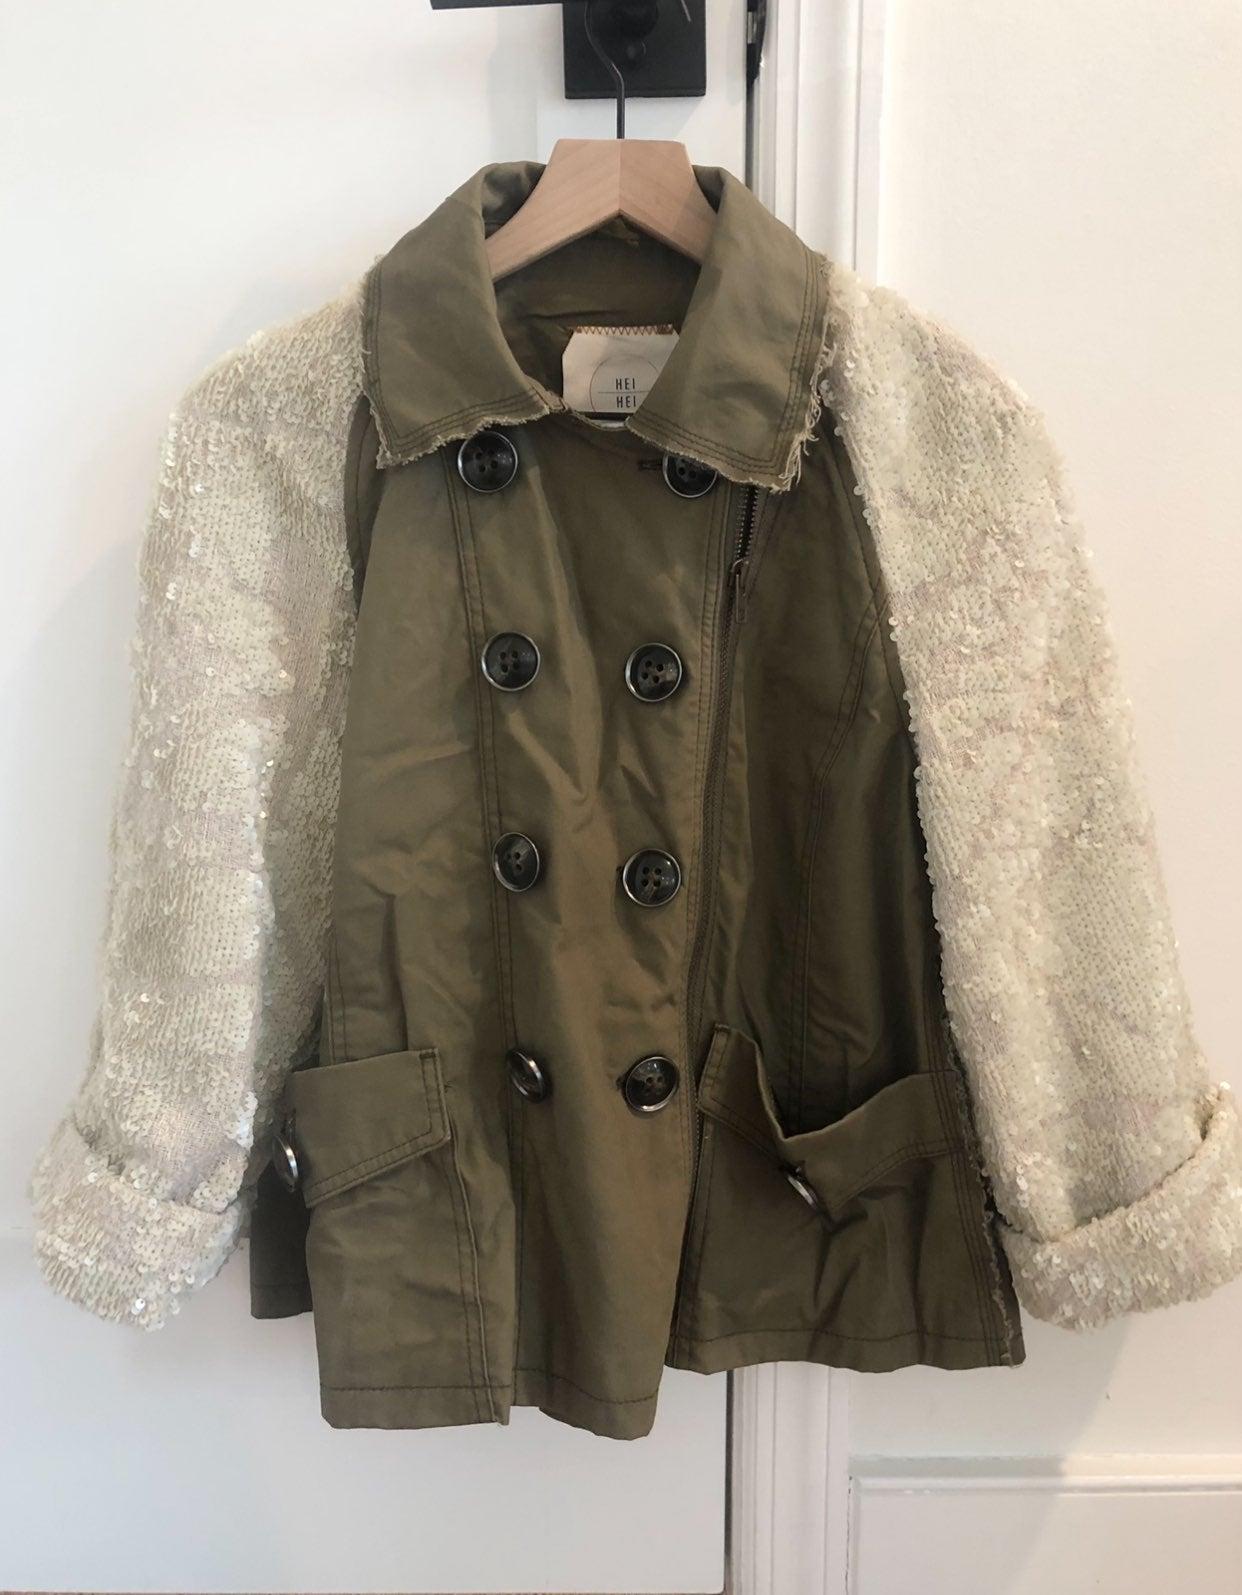 Anthropologie Sequin Sleeve Jacket